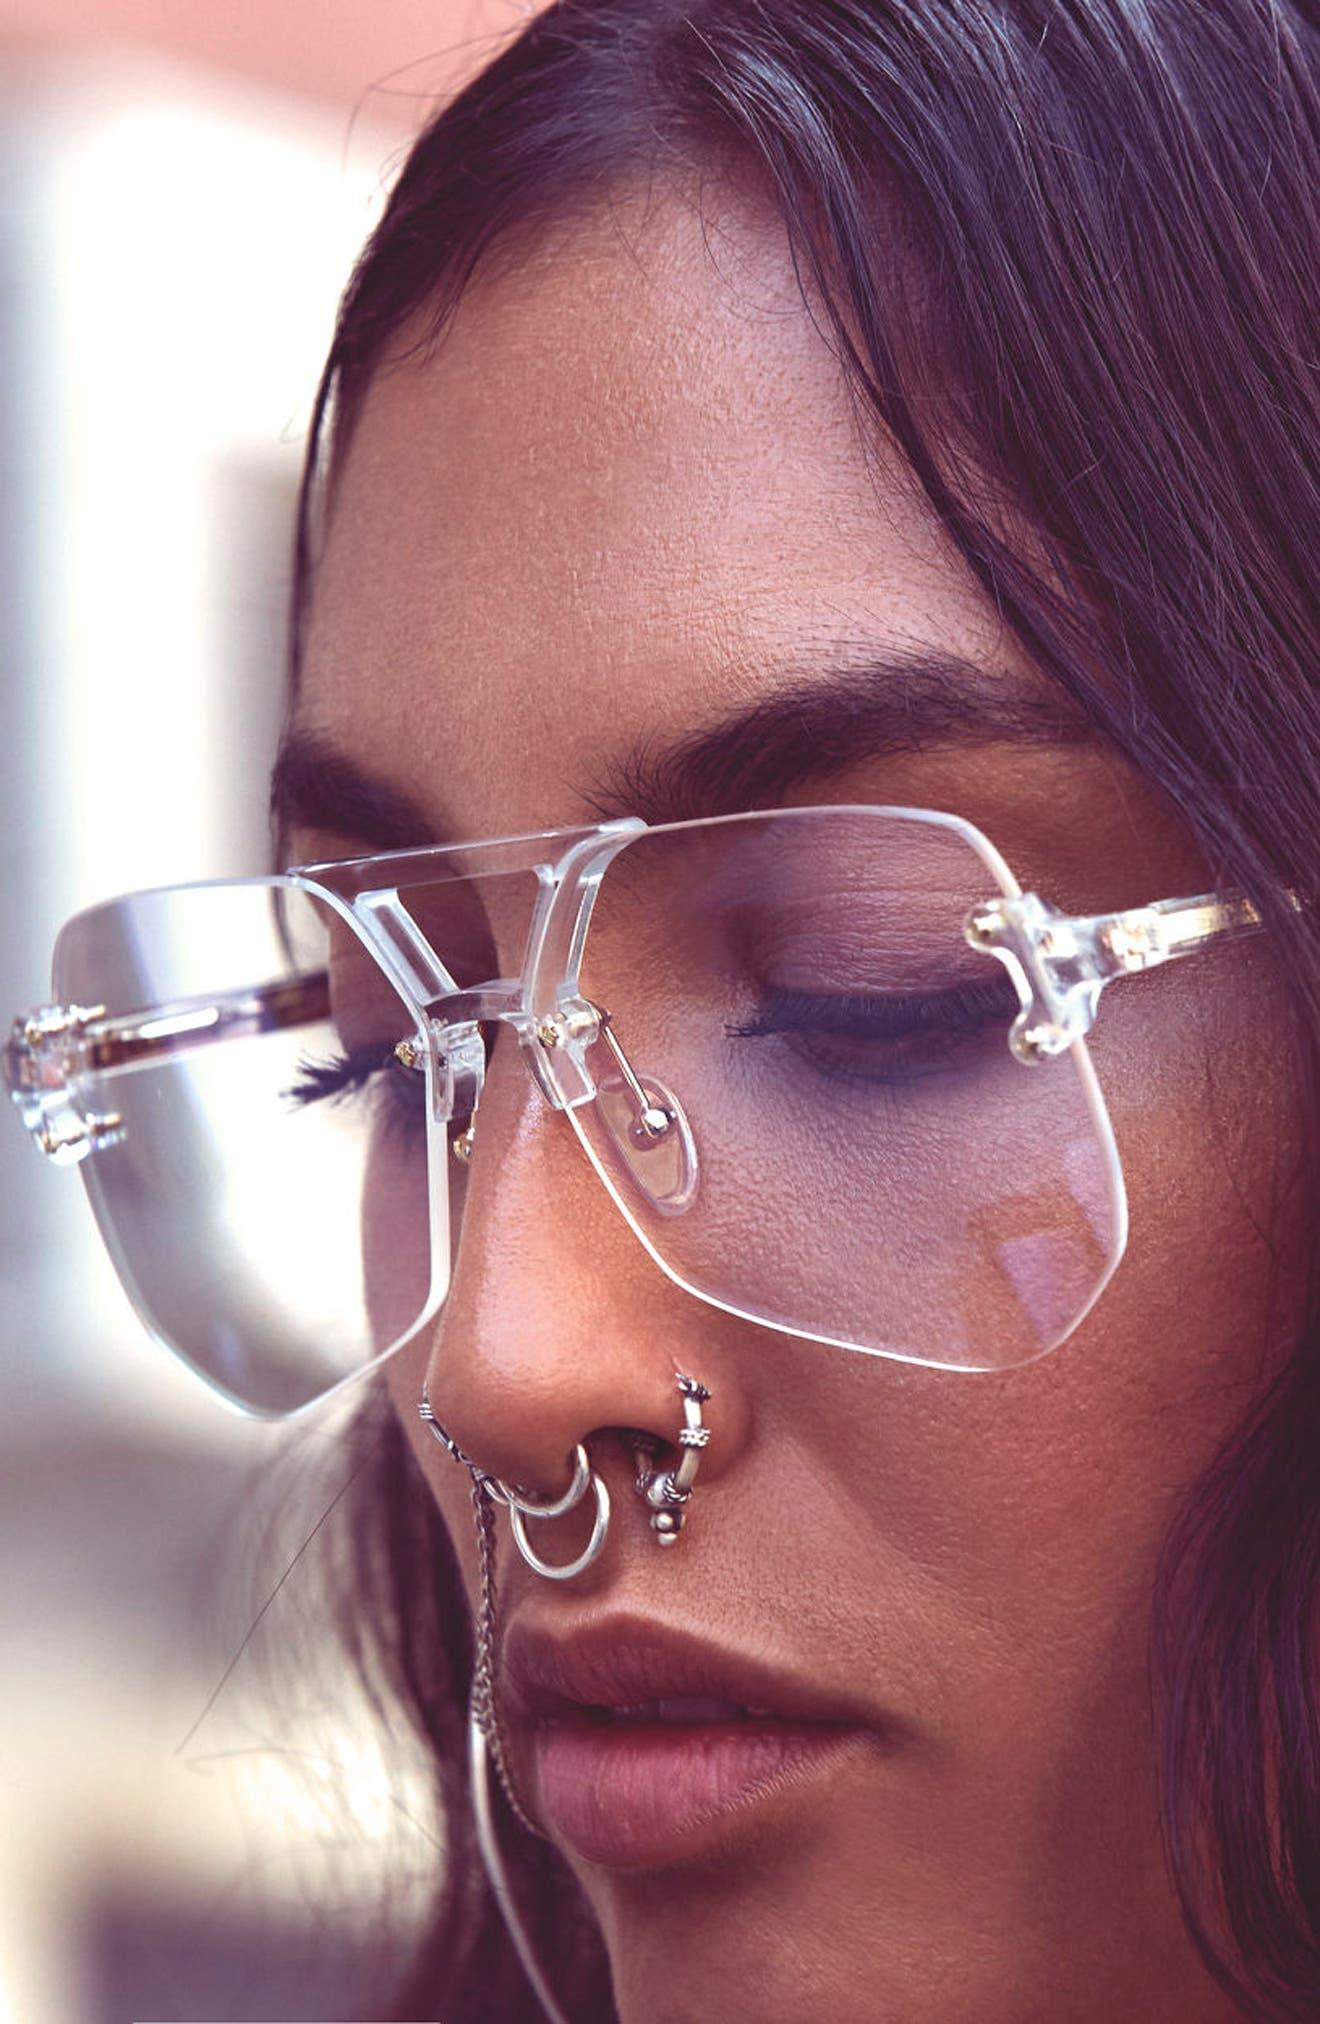 Yesway 60mm Optical Glasses,                             Alternate thumbnail 6, color,                             Gold / Tortoise